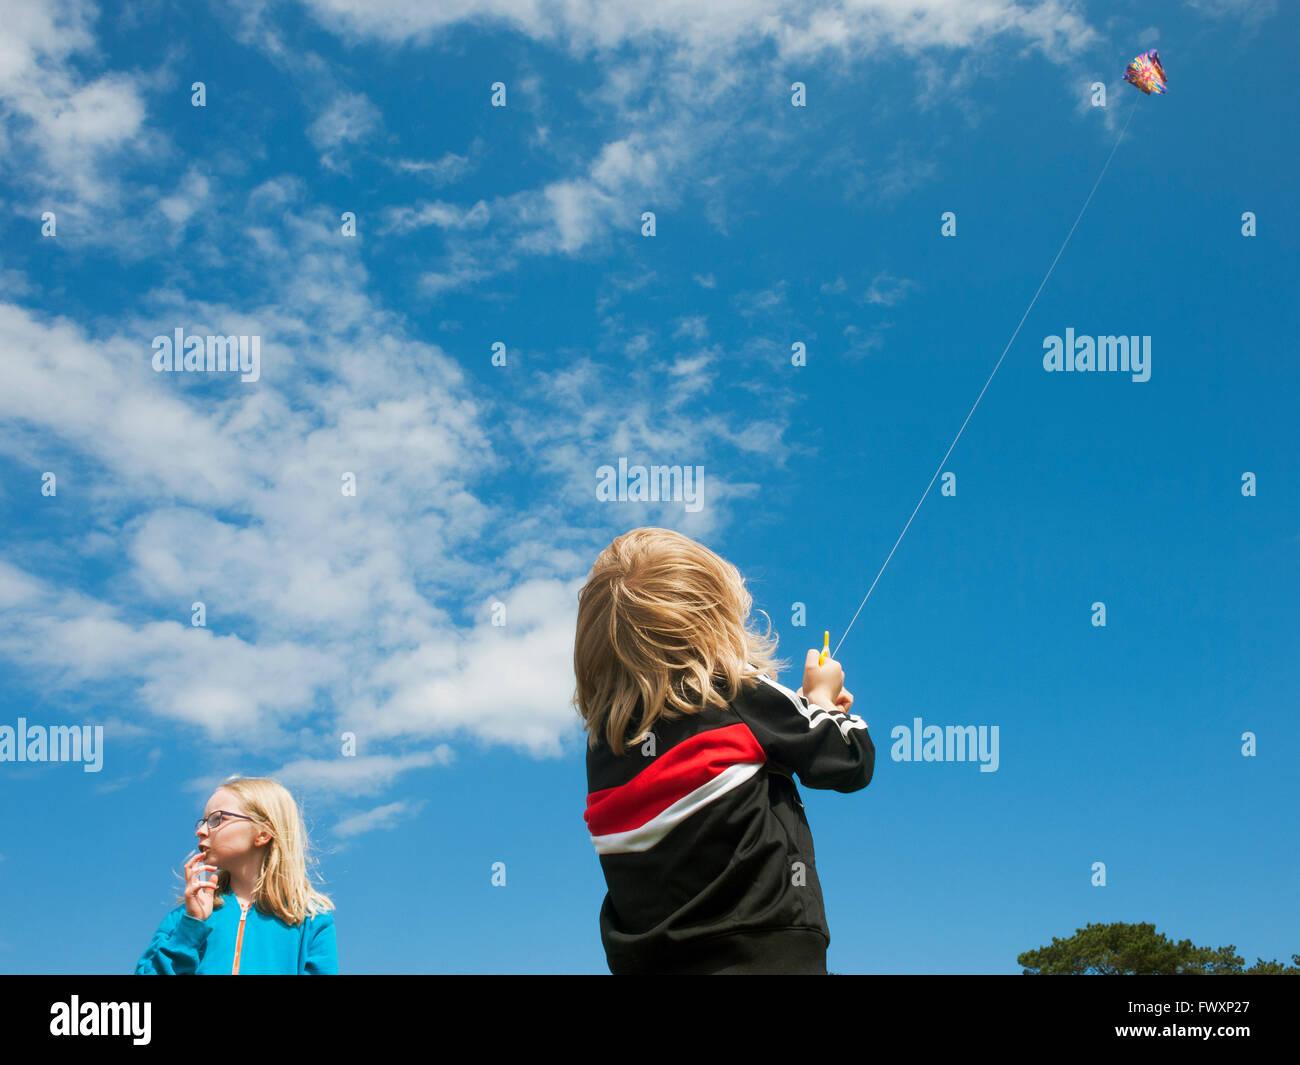 Suecia, Skane, Nyhamnslage, Dos Hermanas (6-7, 10-11) flying kite Imagen De Stock